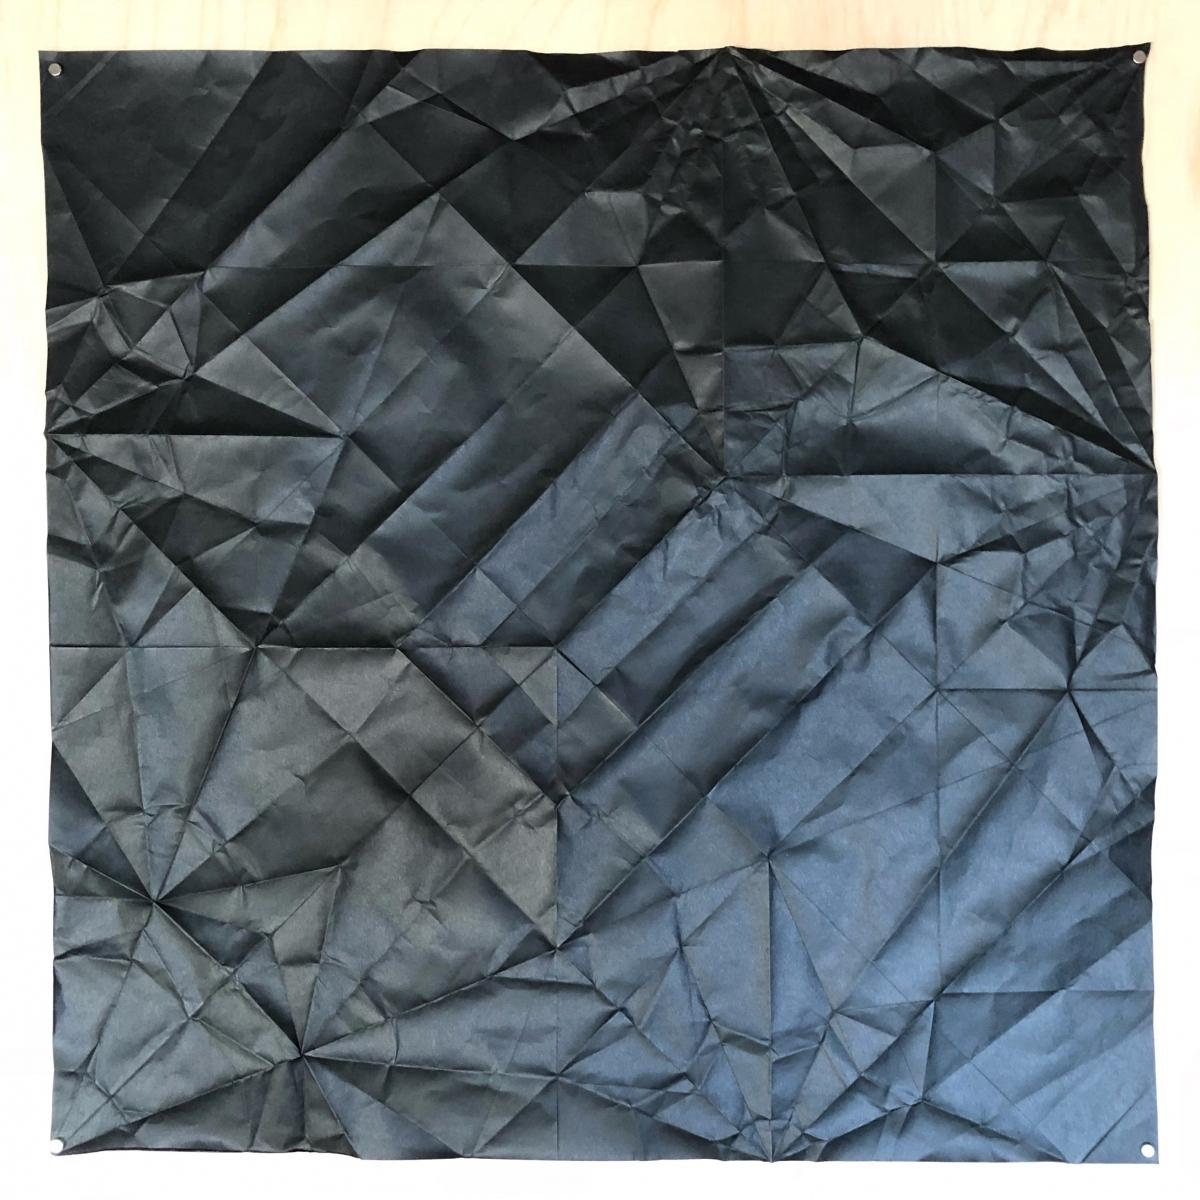 Dachshund, , 70 x 70 cm crease pattern [John Montroll]